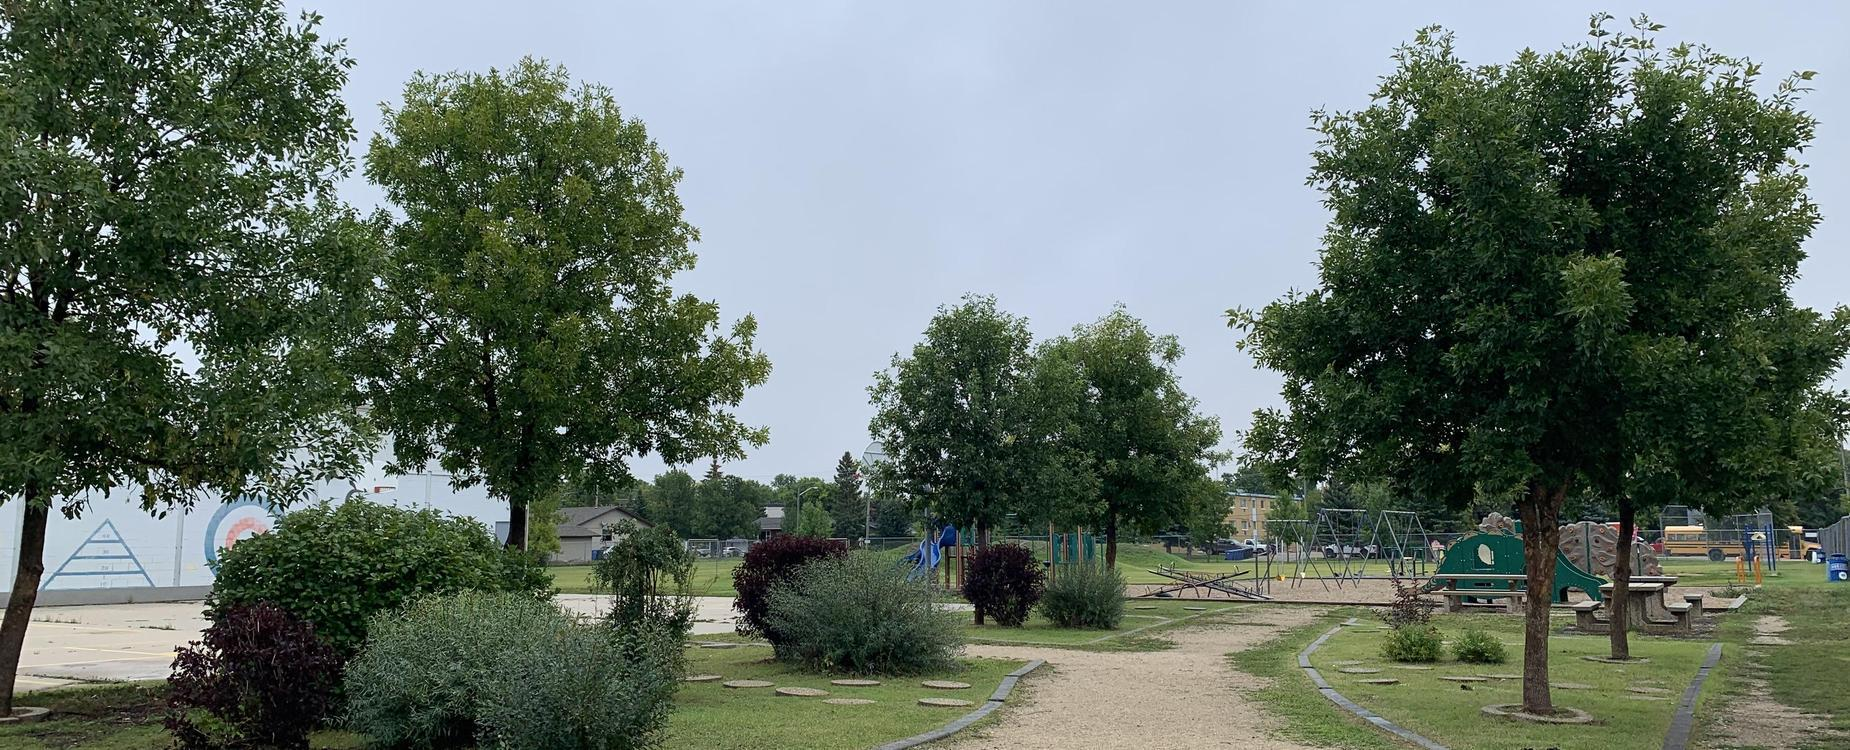 Ecole Macneill Playground